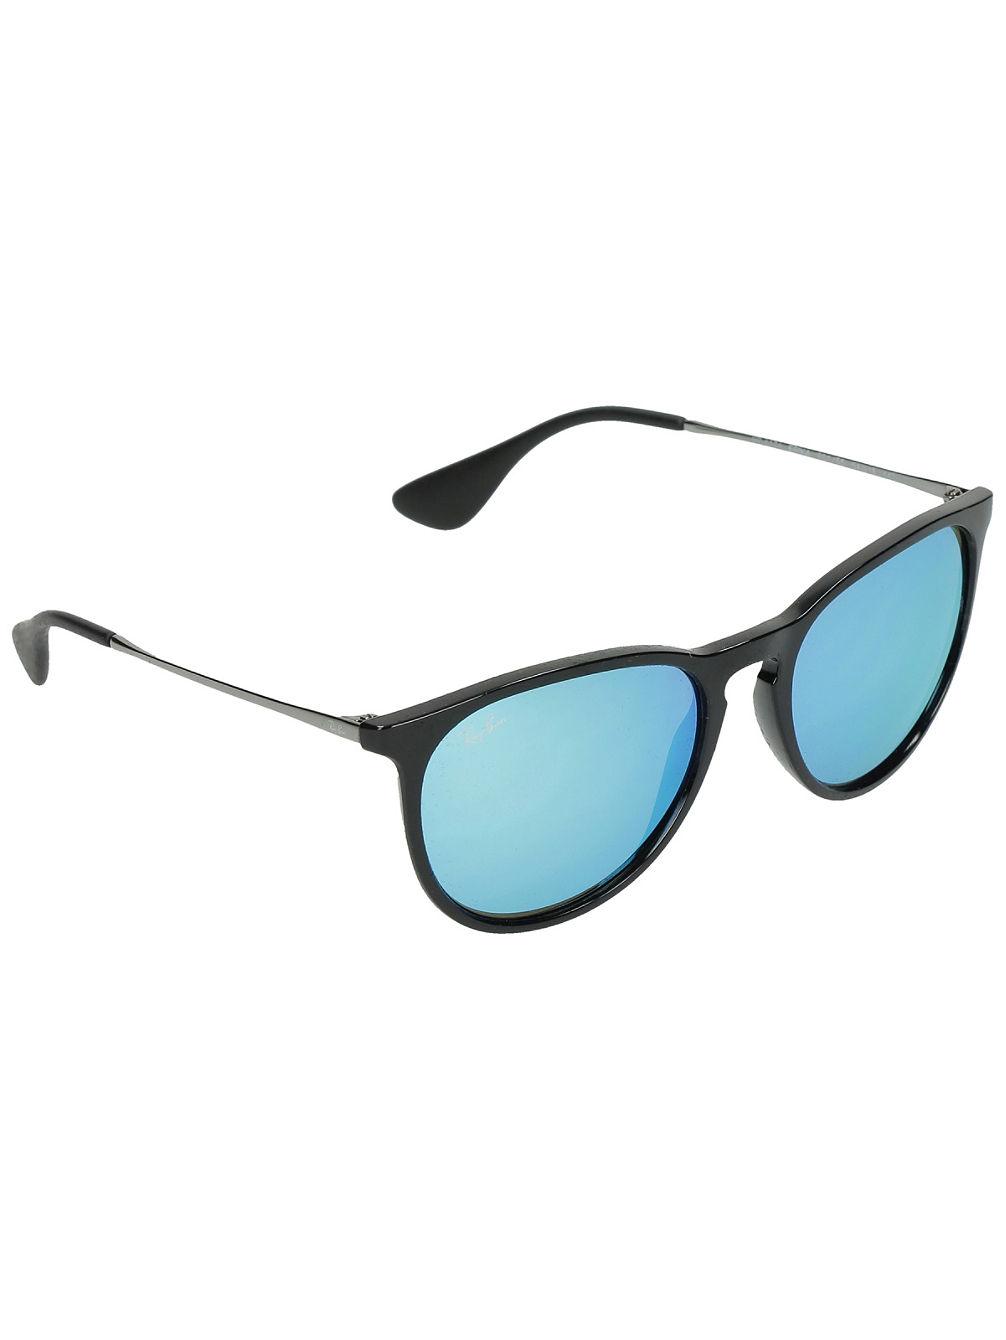 ray ban erika black sonnenbrille online kaufen bei blue. Black Bedroom Furniture Sets. Home Design Ideas